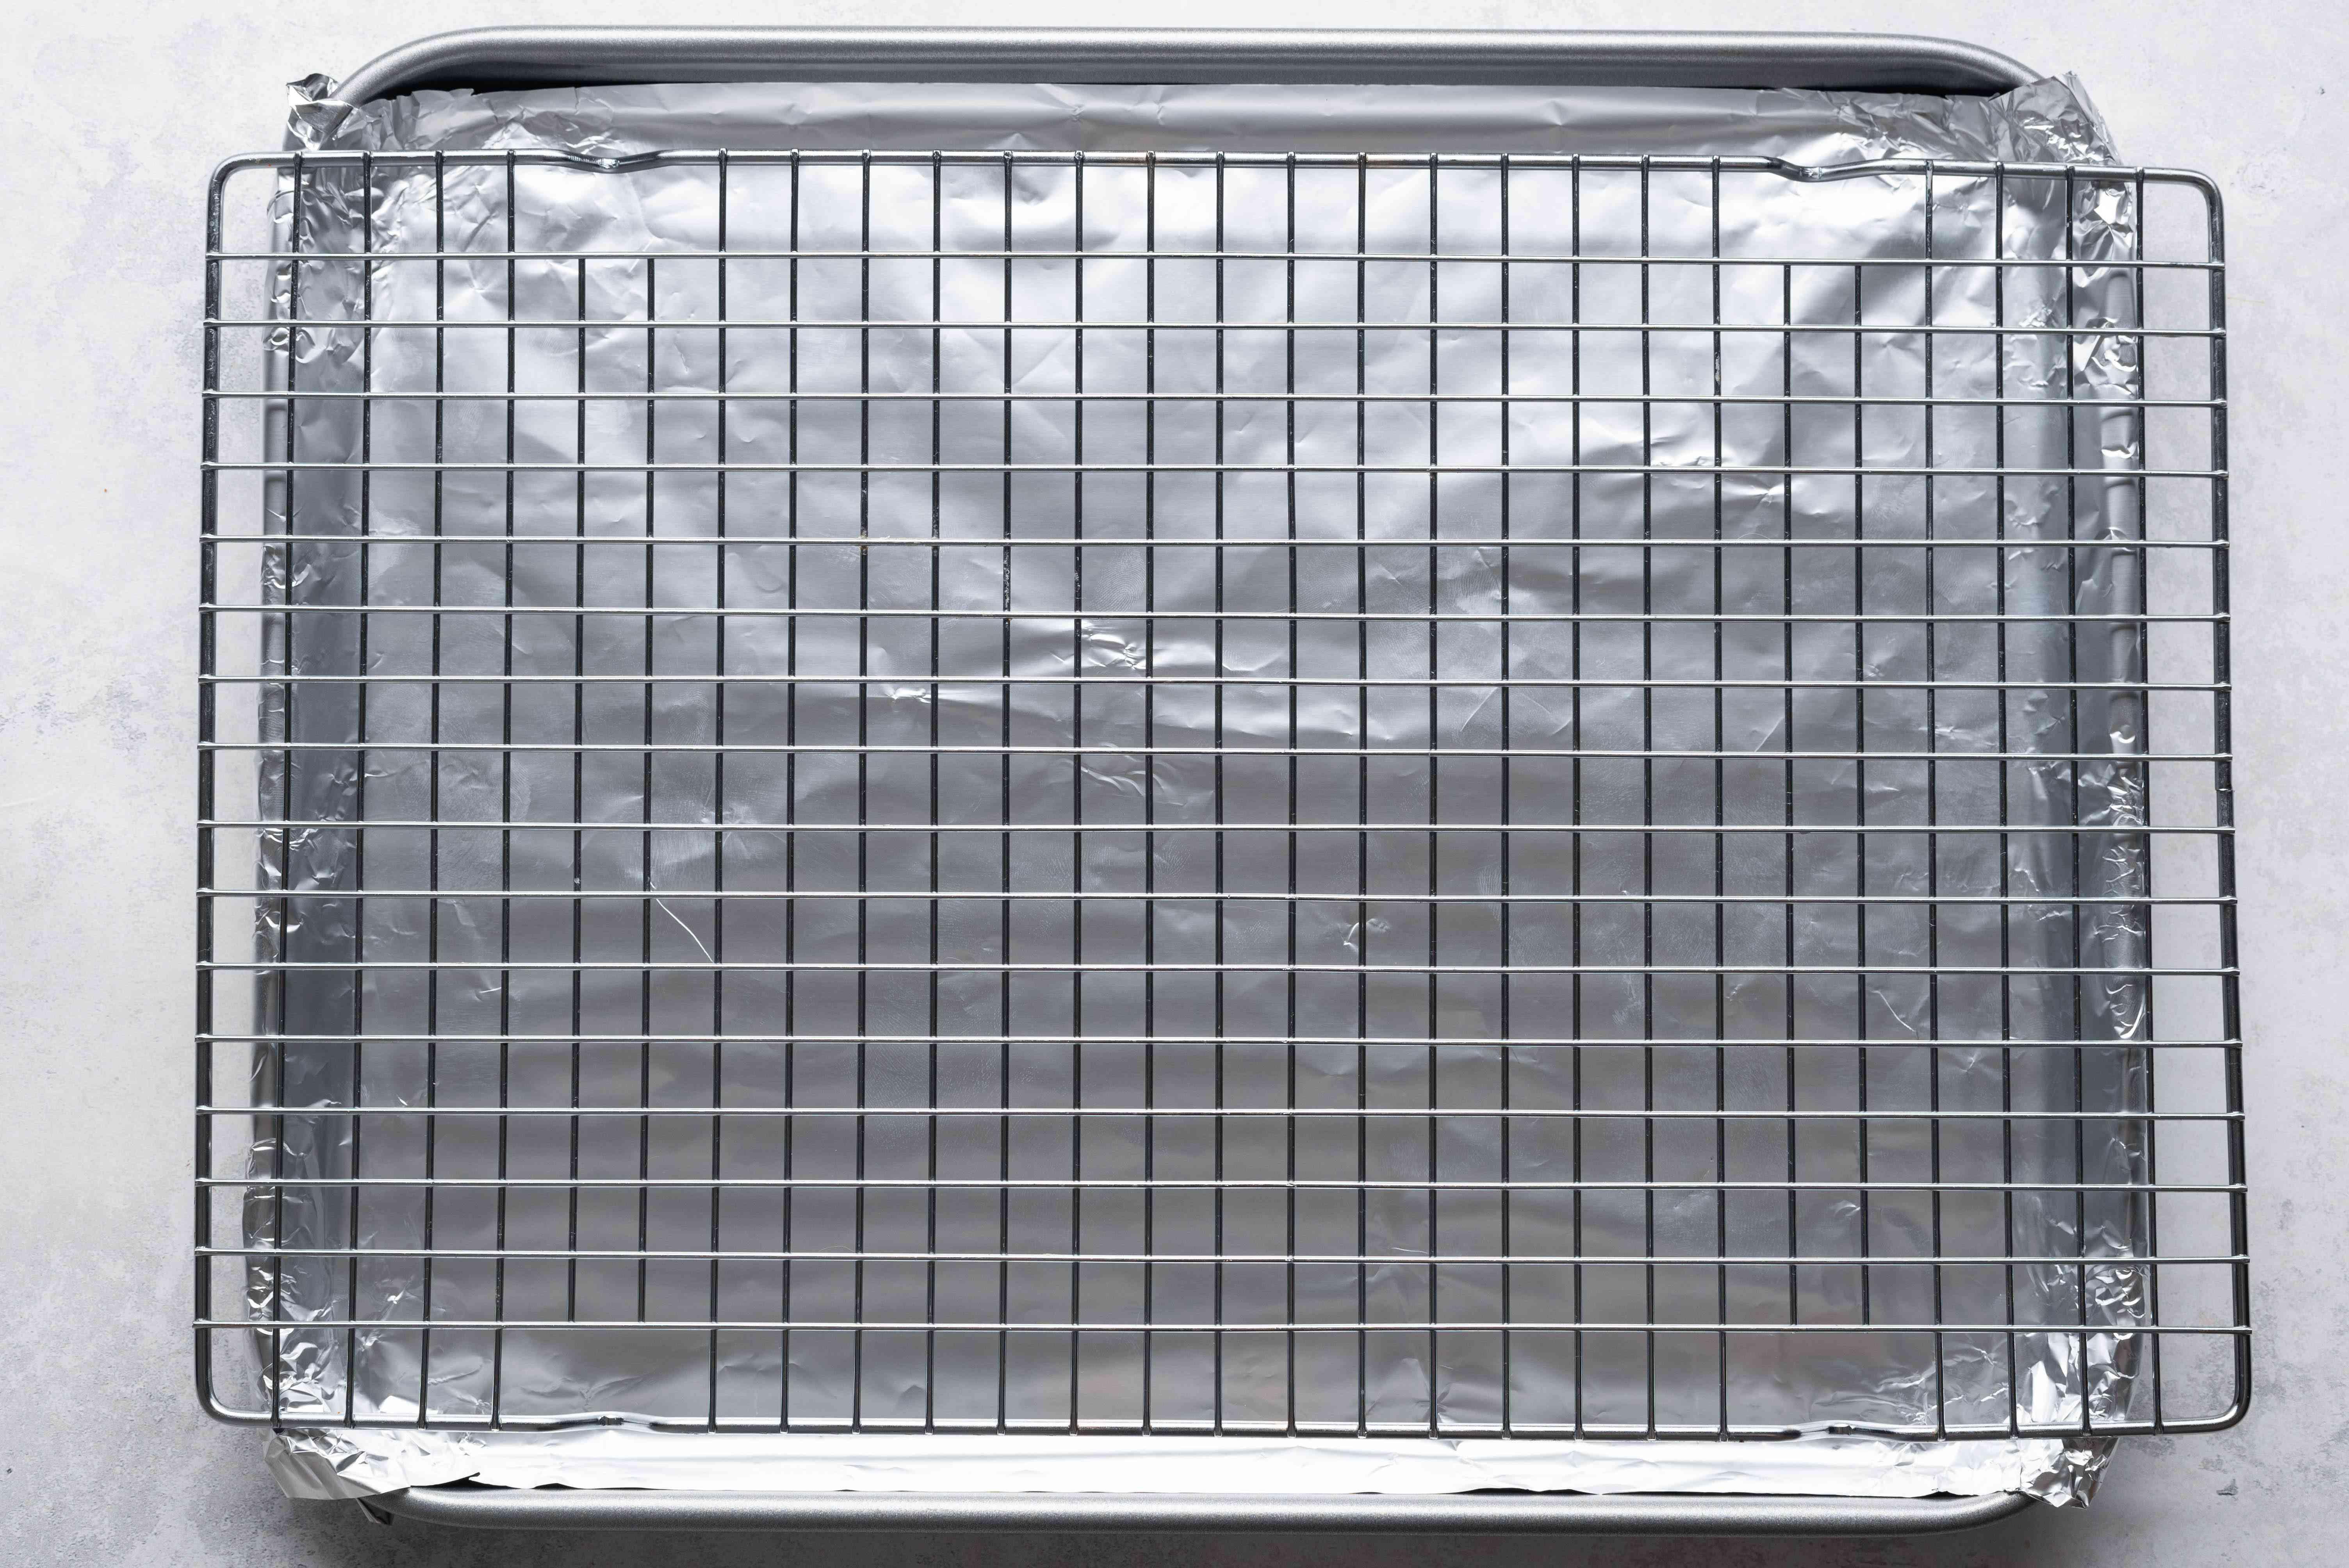 Cooling rack on a baking sheet